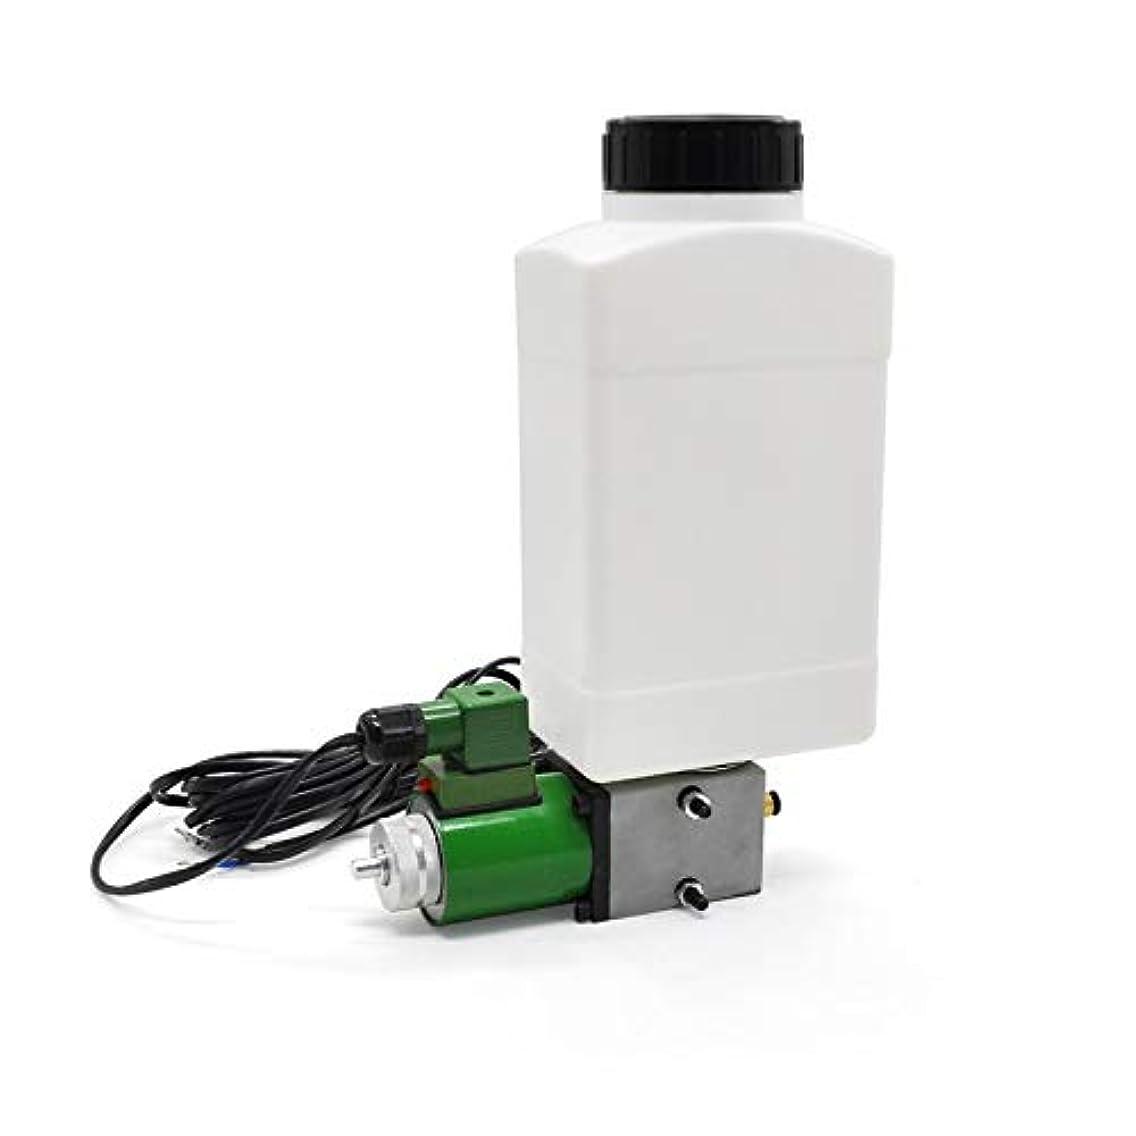 Pumps New 2L 4L 220V Lubricant Pump Automatic Lubricating Oil Pump Electromagnetic Lubrication Pump Lubricator For Elevator SLR CNC - (Voltage: 2L)